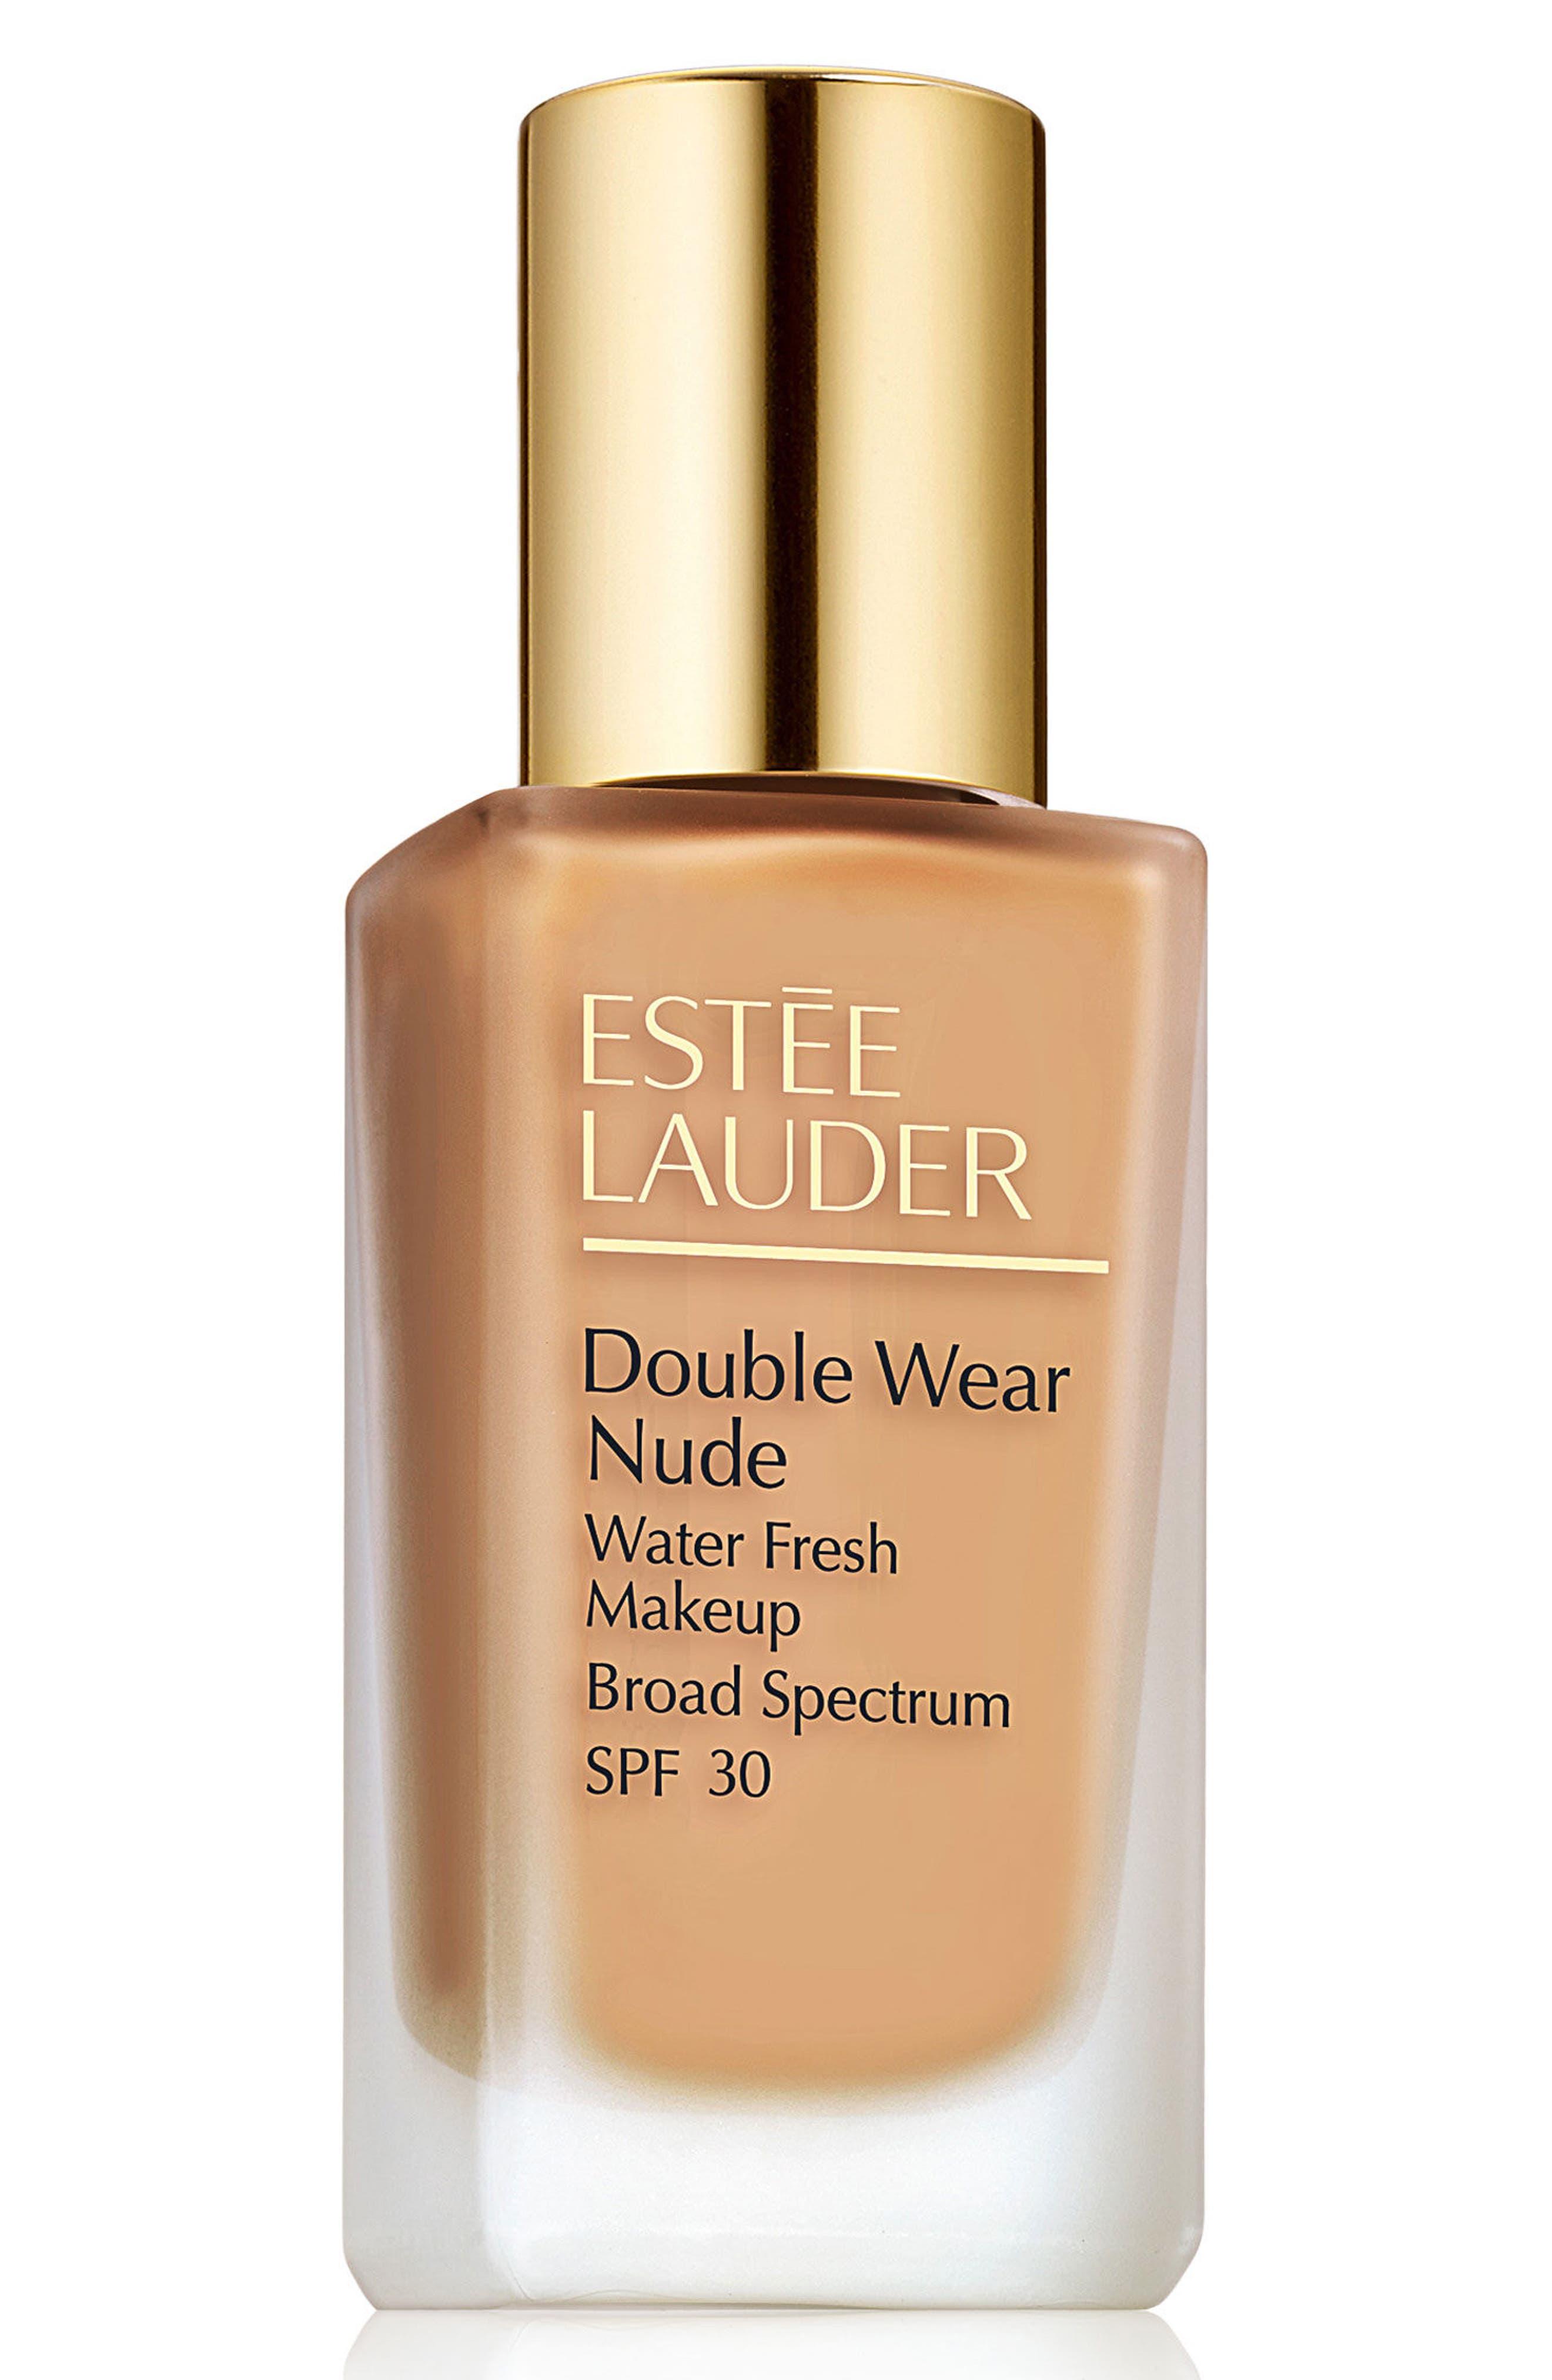 Estee Lauder Double Wear Nude Water Fresh Makeup Broad Spectrum Spf 30 - 3W1 Tawny